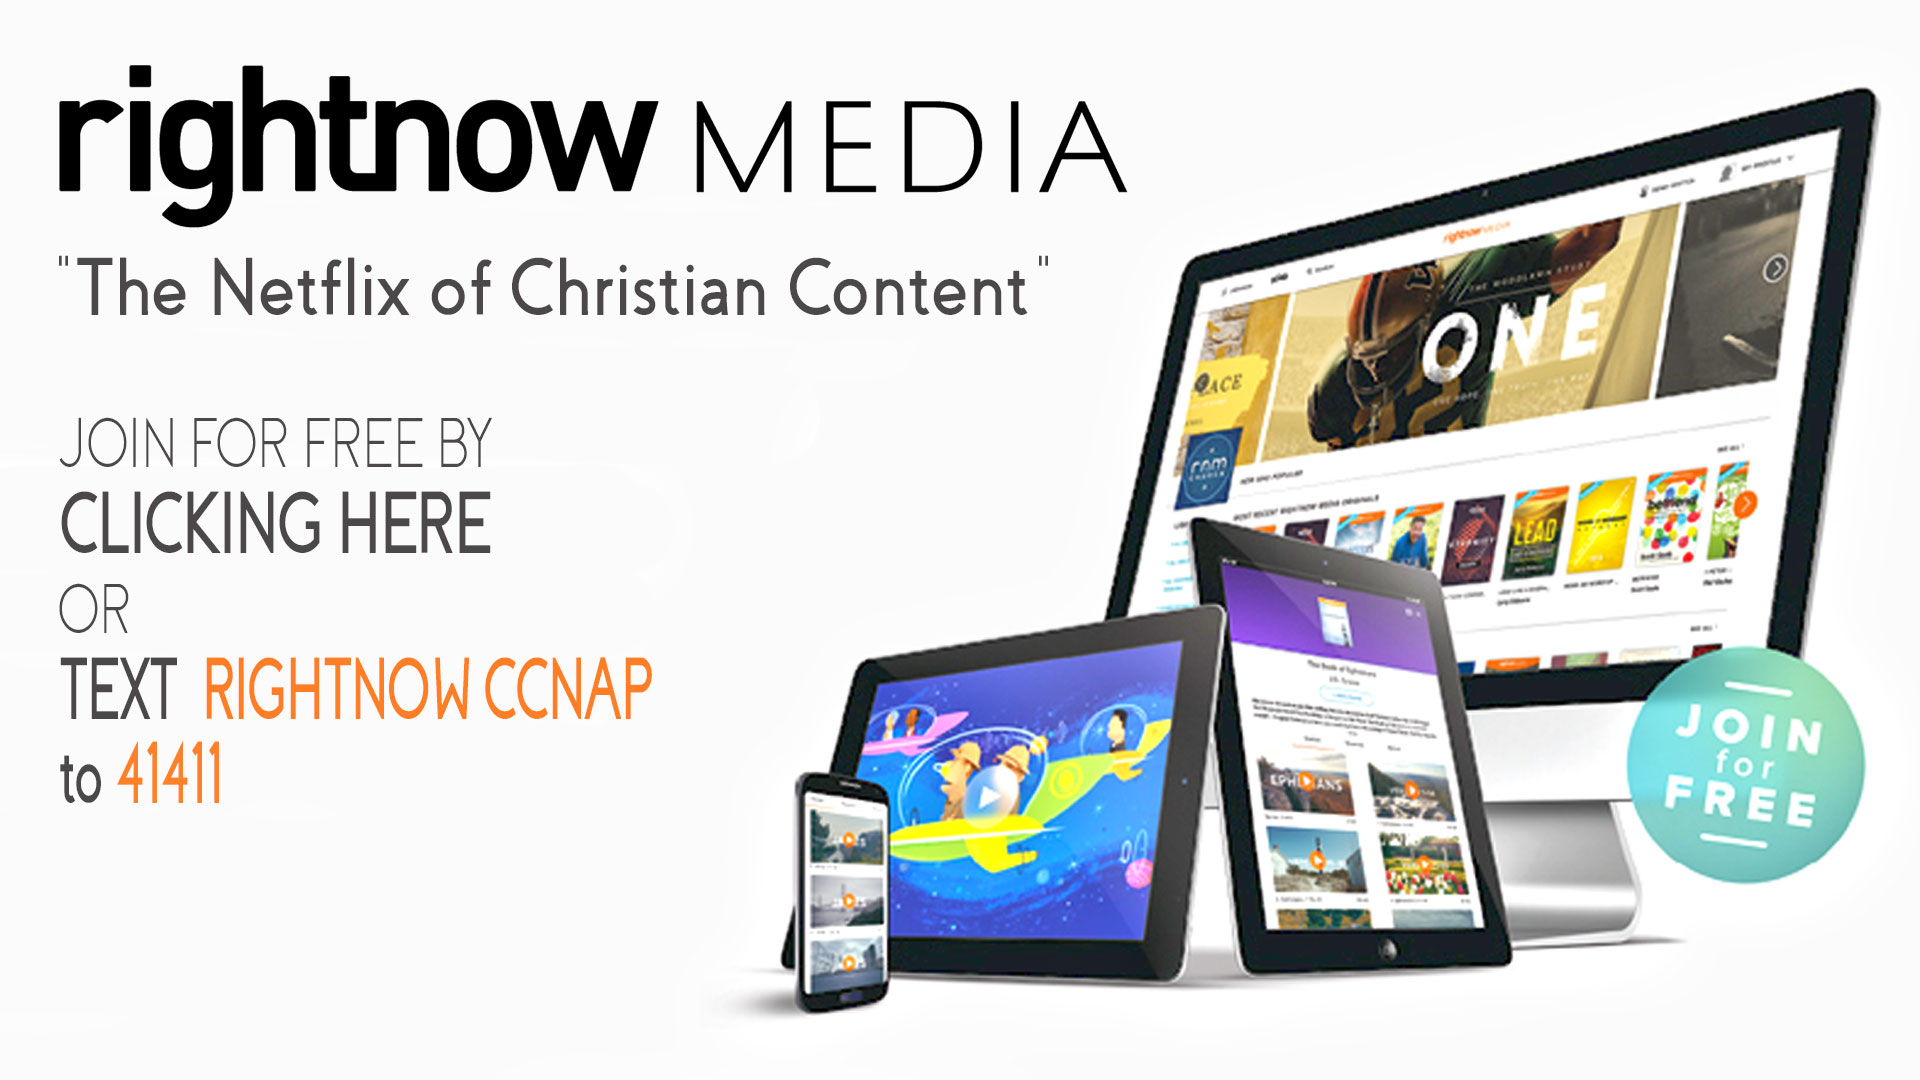 RightNow-Media-Web-Banner.jpg